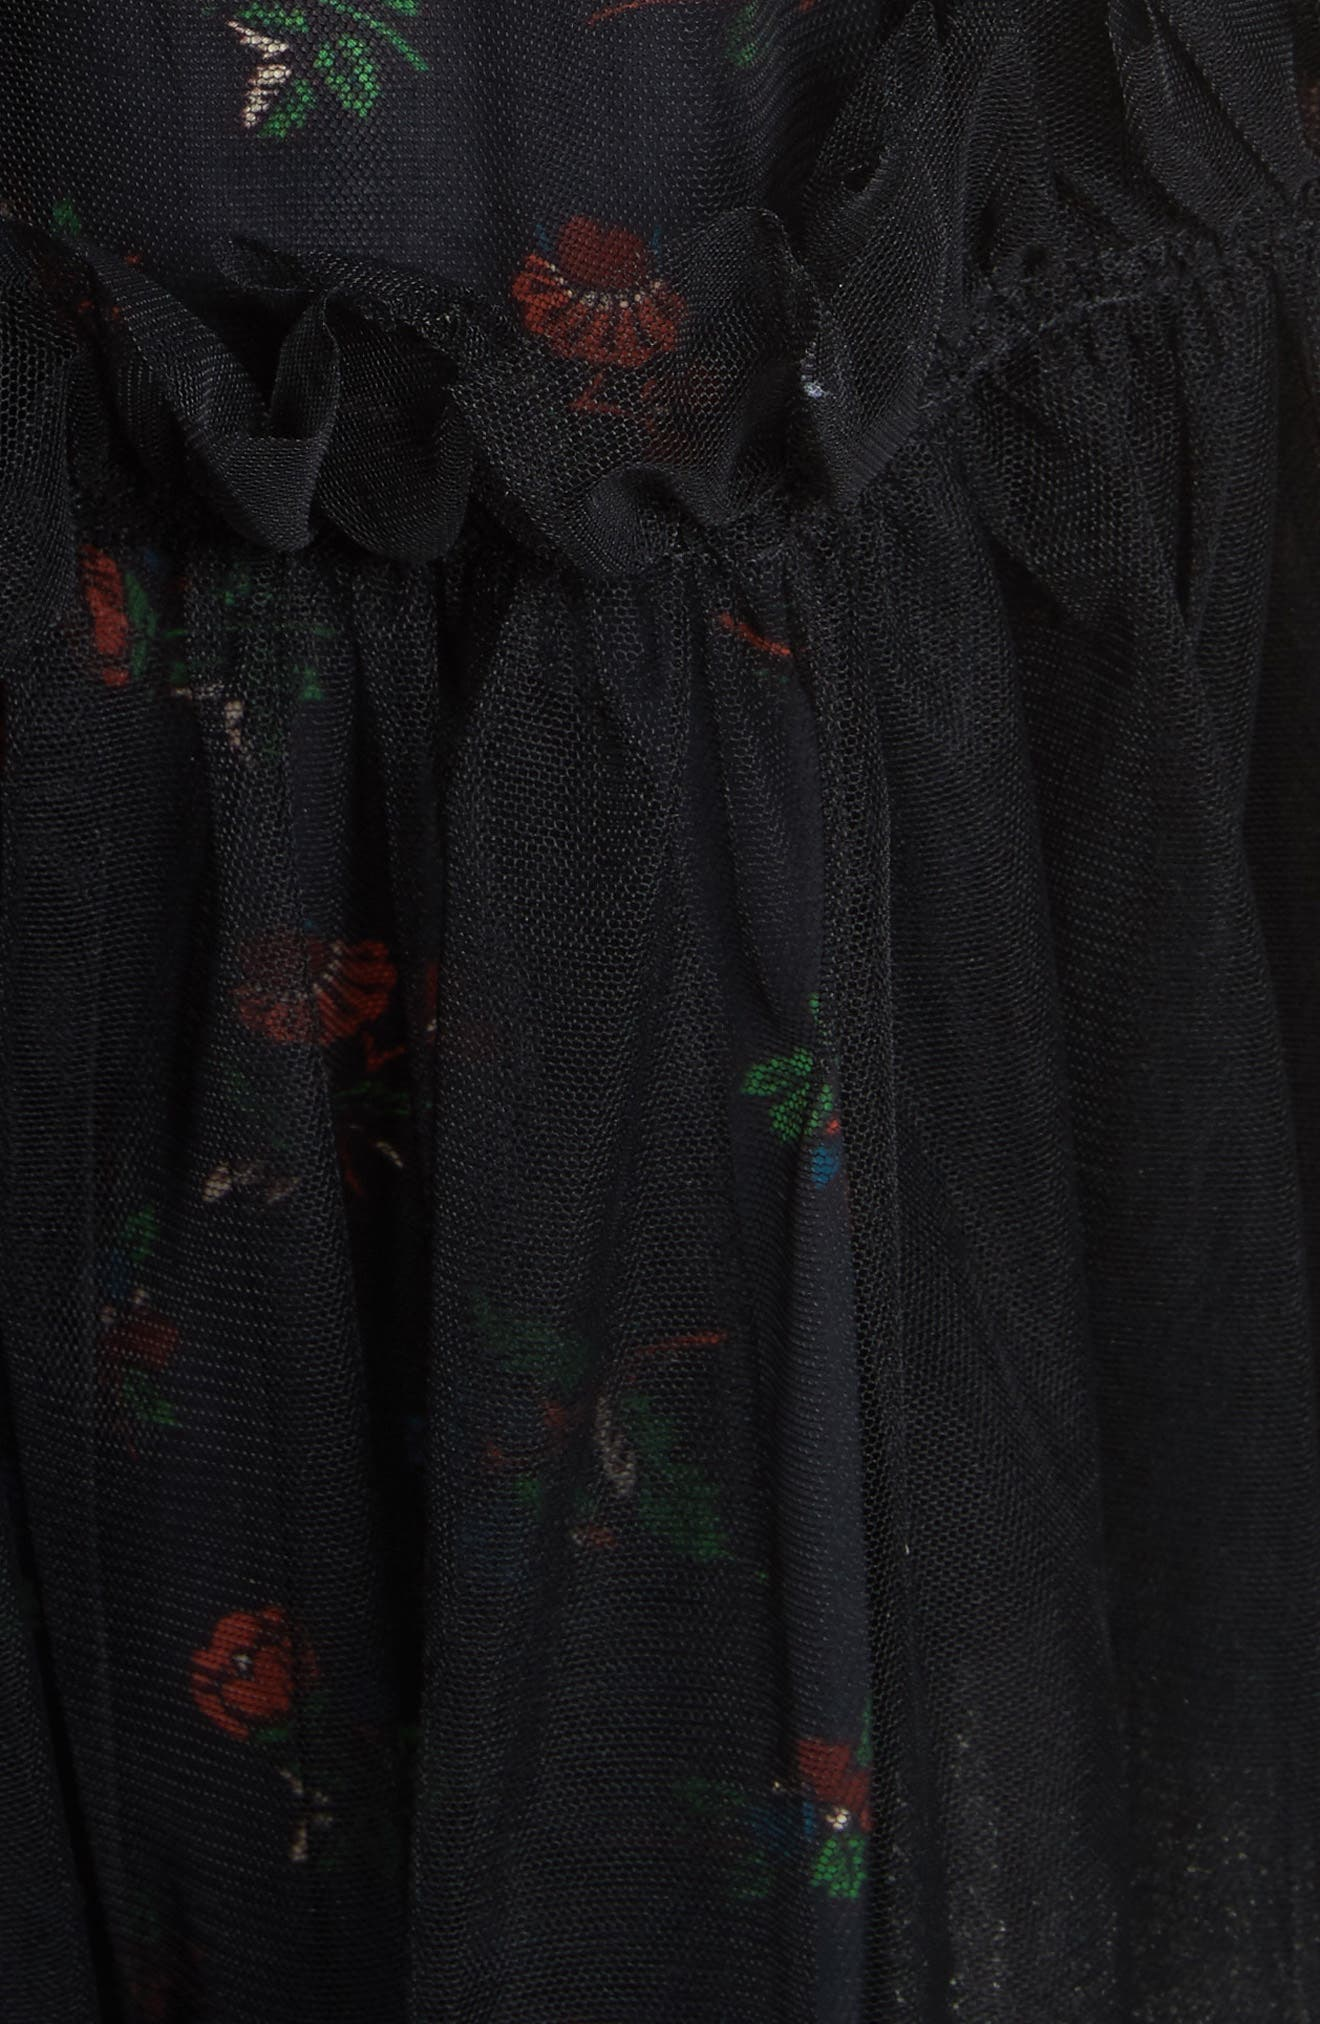 Ruby Tulle Floral Dress,                             Alternate thumbnail 6, color,                             Black